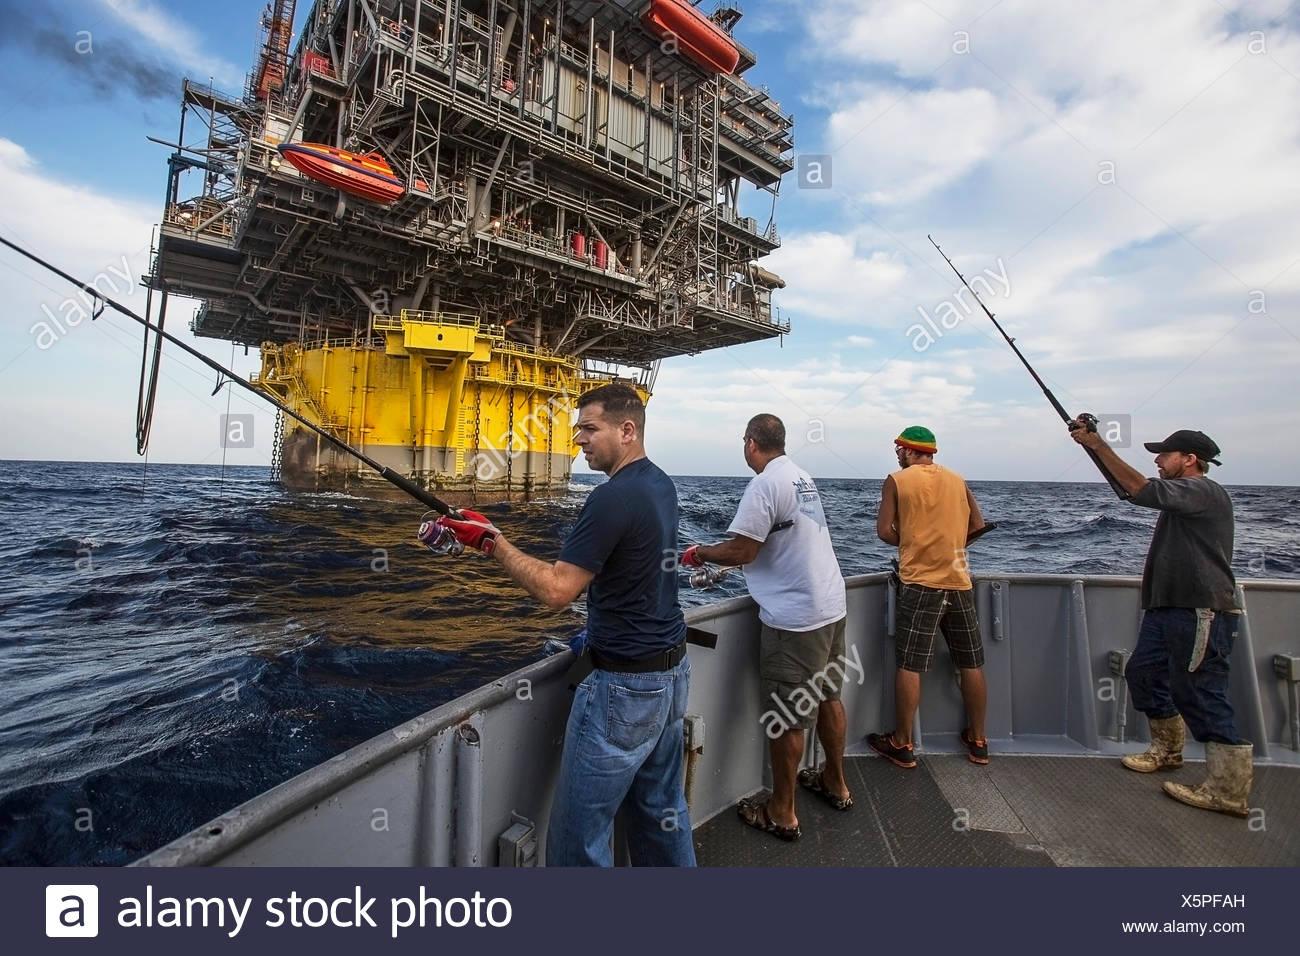 Perdido Oil Stock Photos & Perdido Oil Stock Images - Alamy